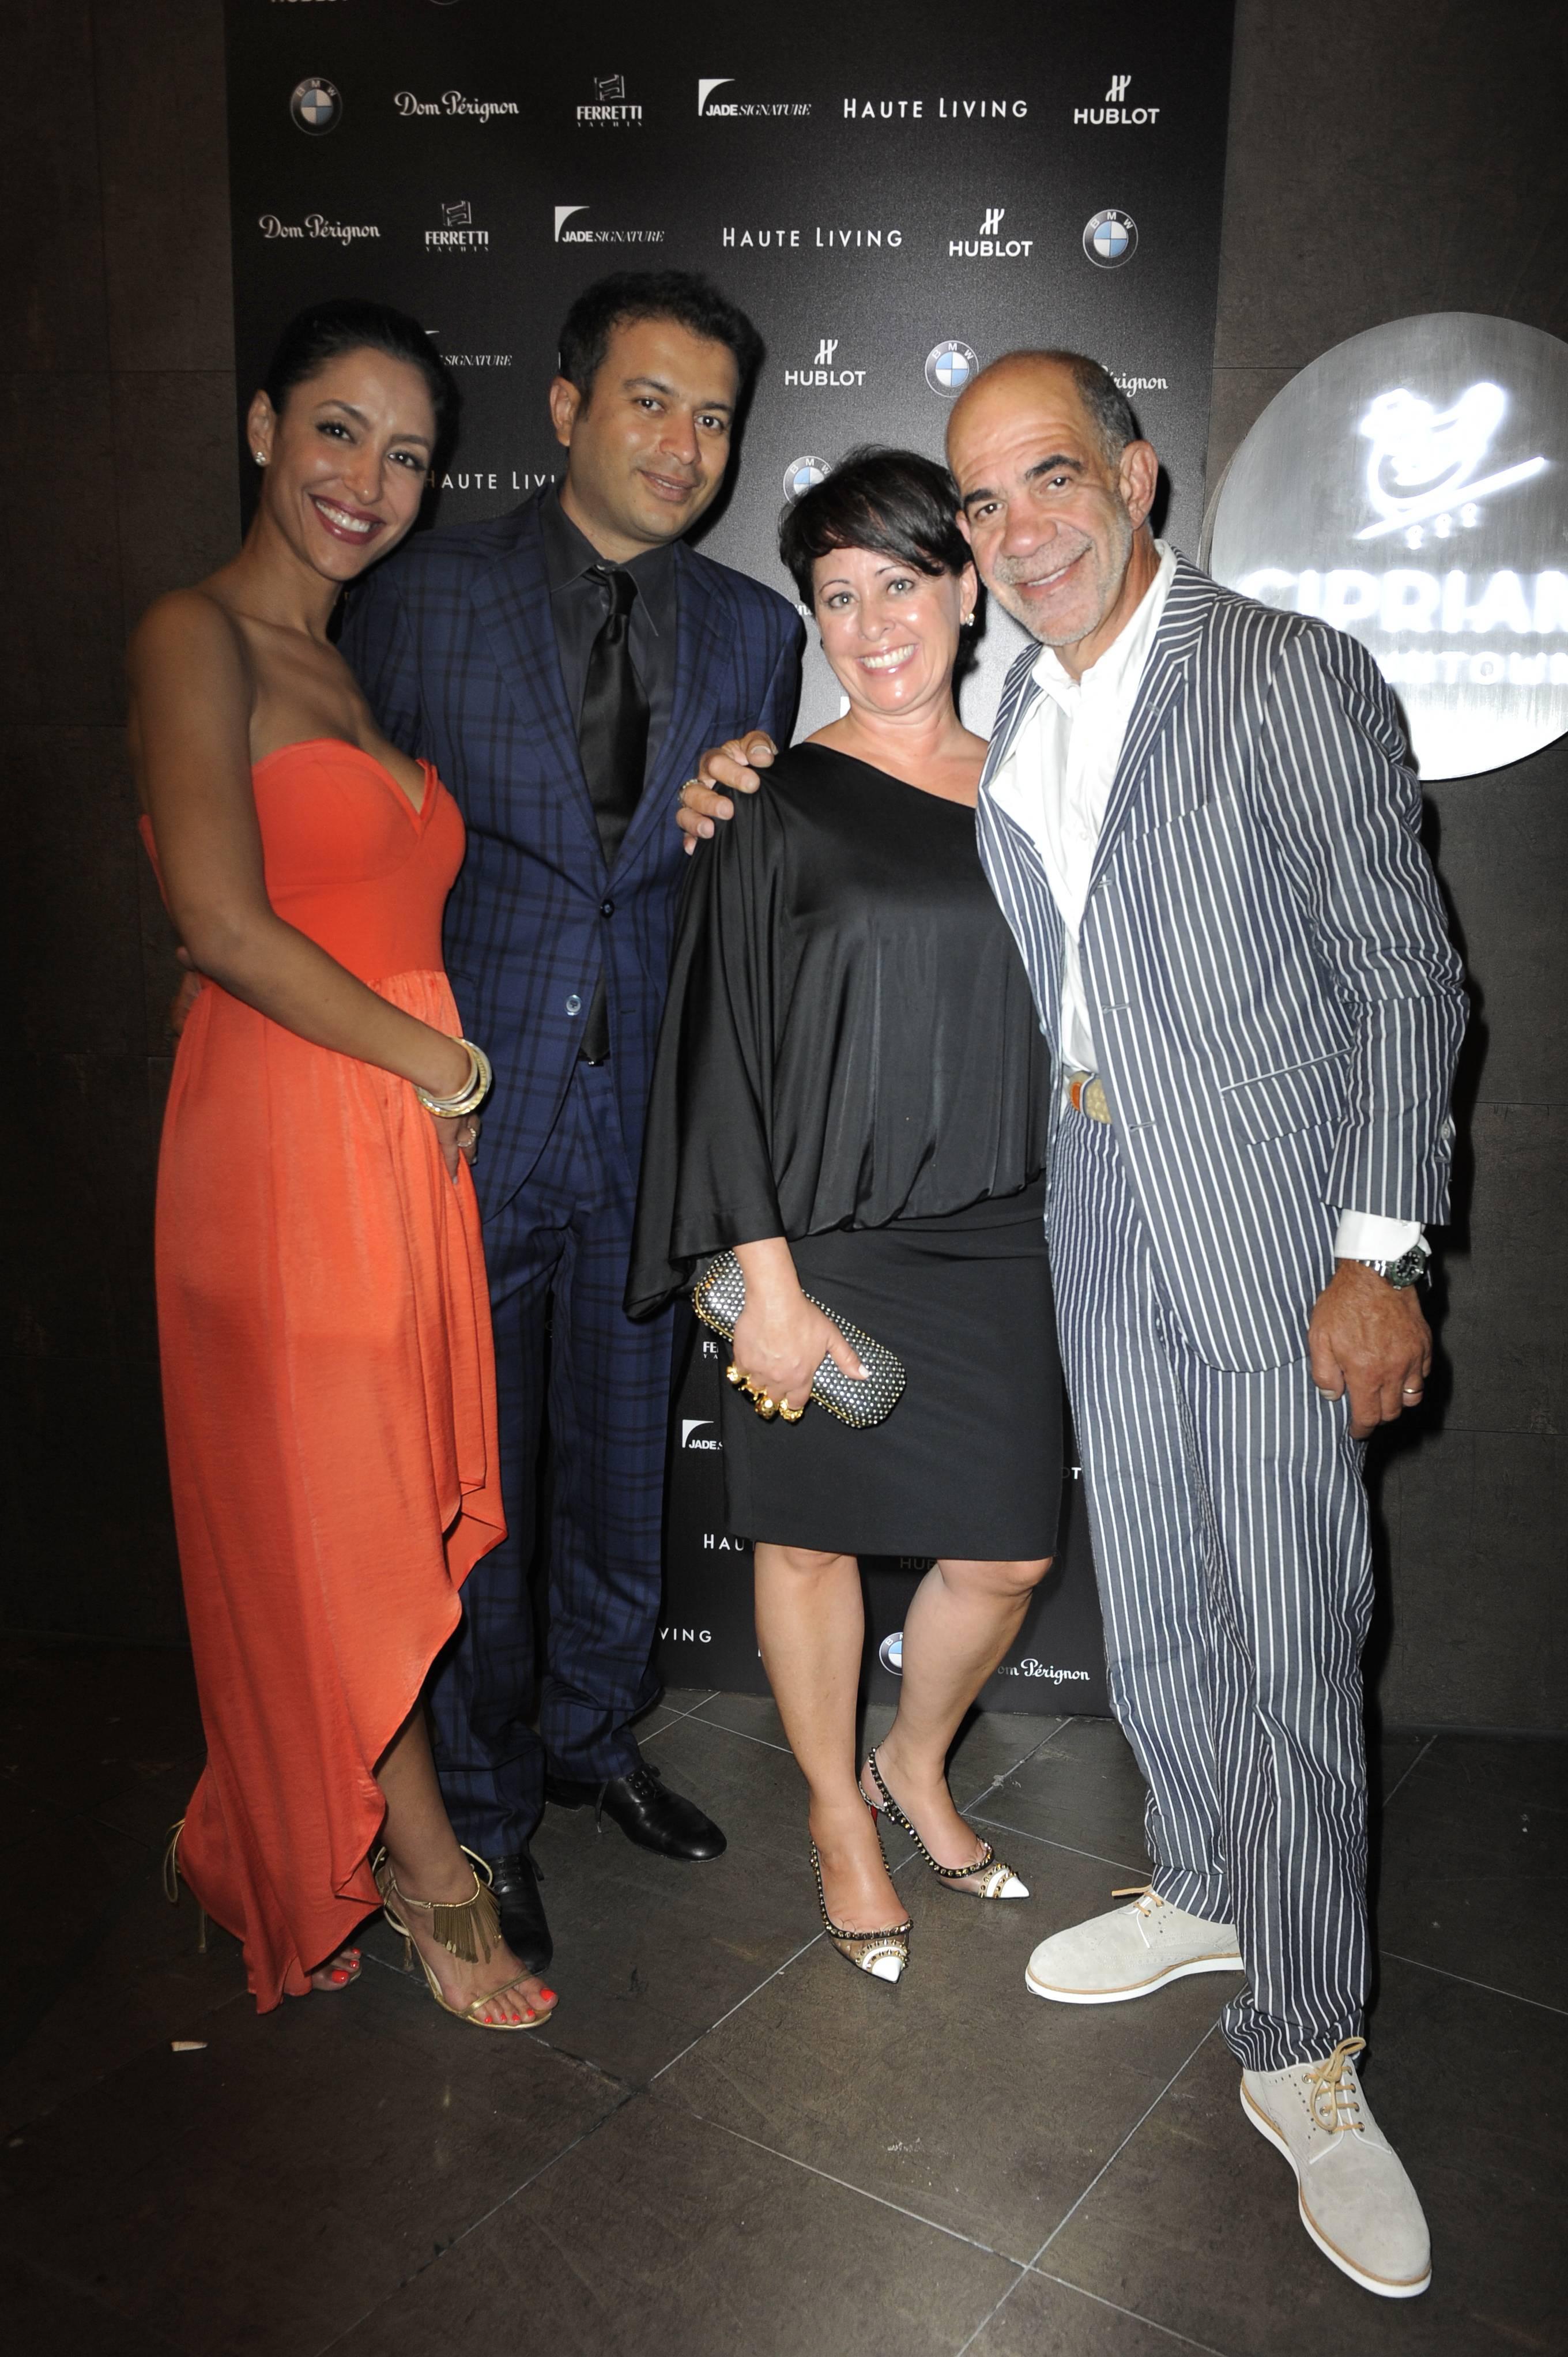 Violet Camacho, Kamal Hotchandani, Ruth and Alan Zelcer